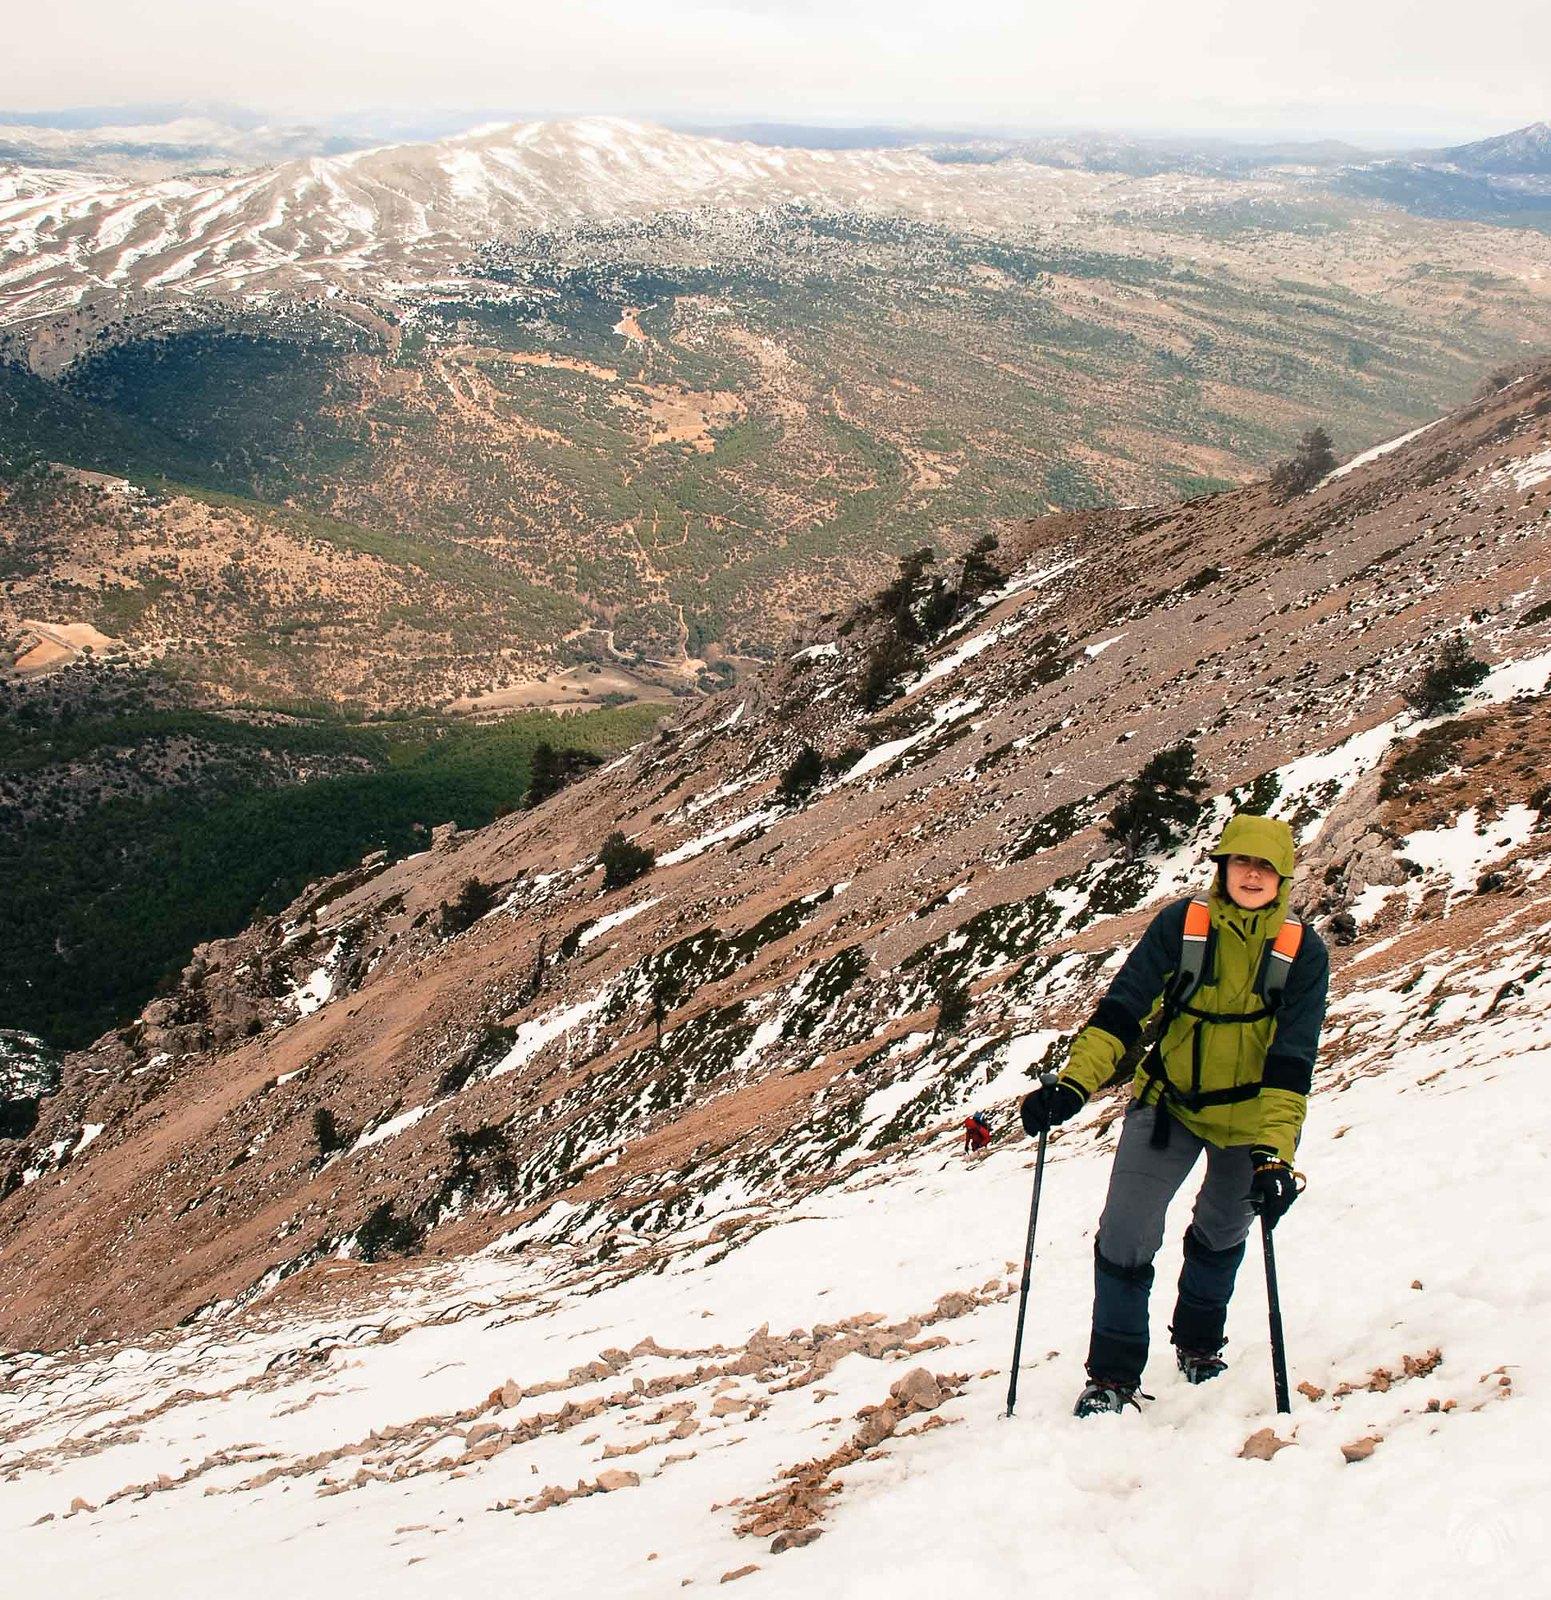 Llegando a la zona de cumbres